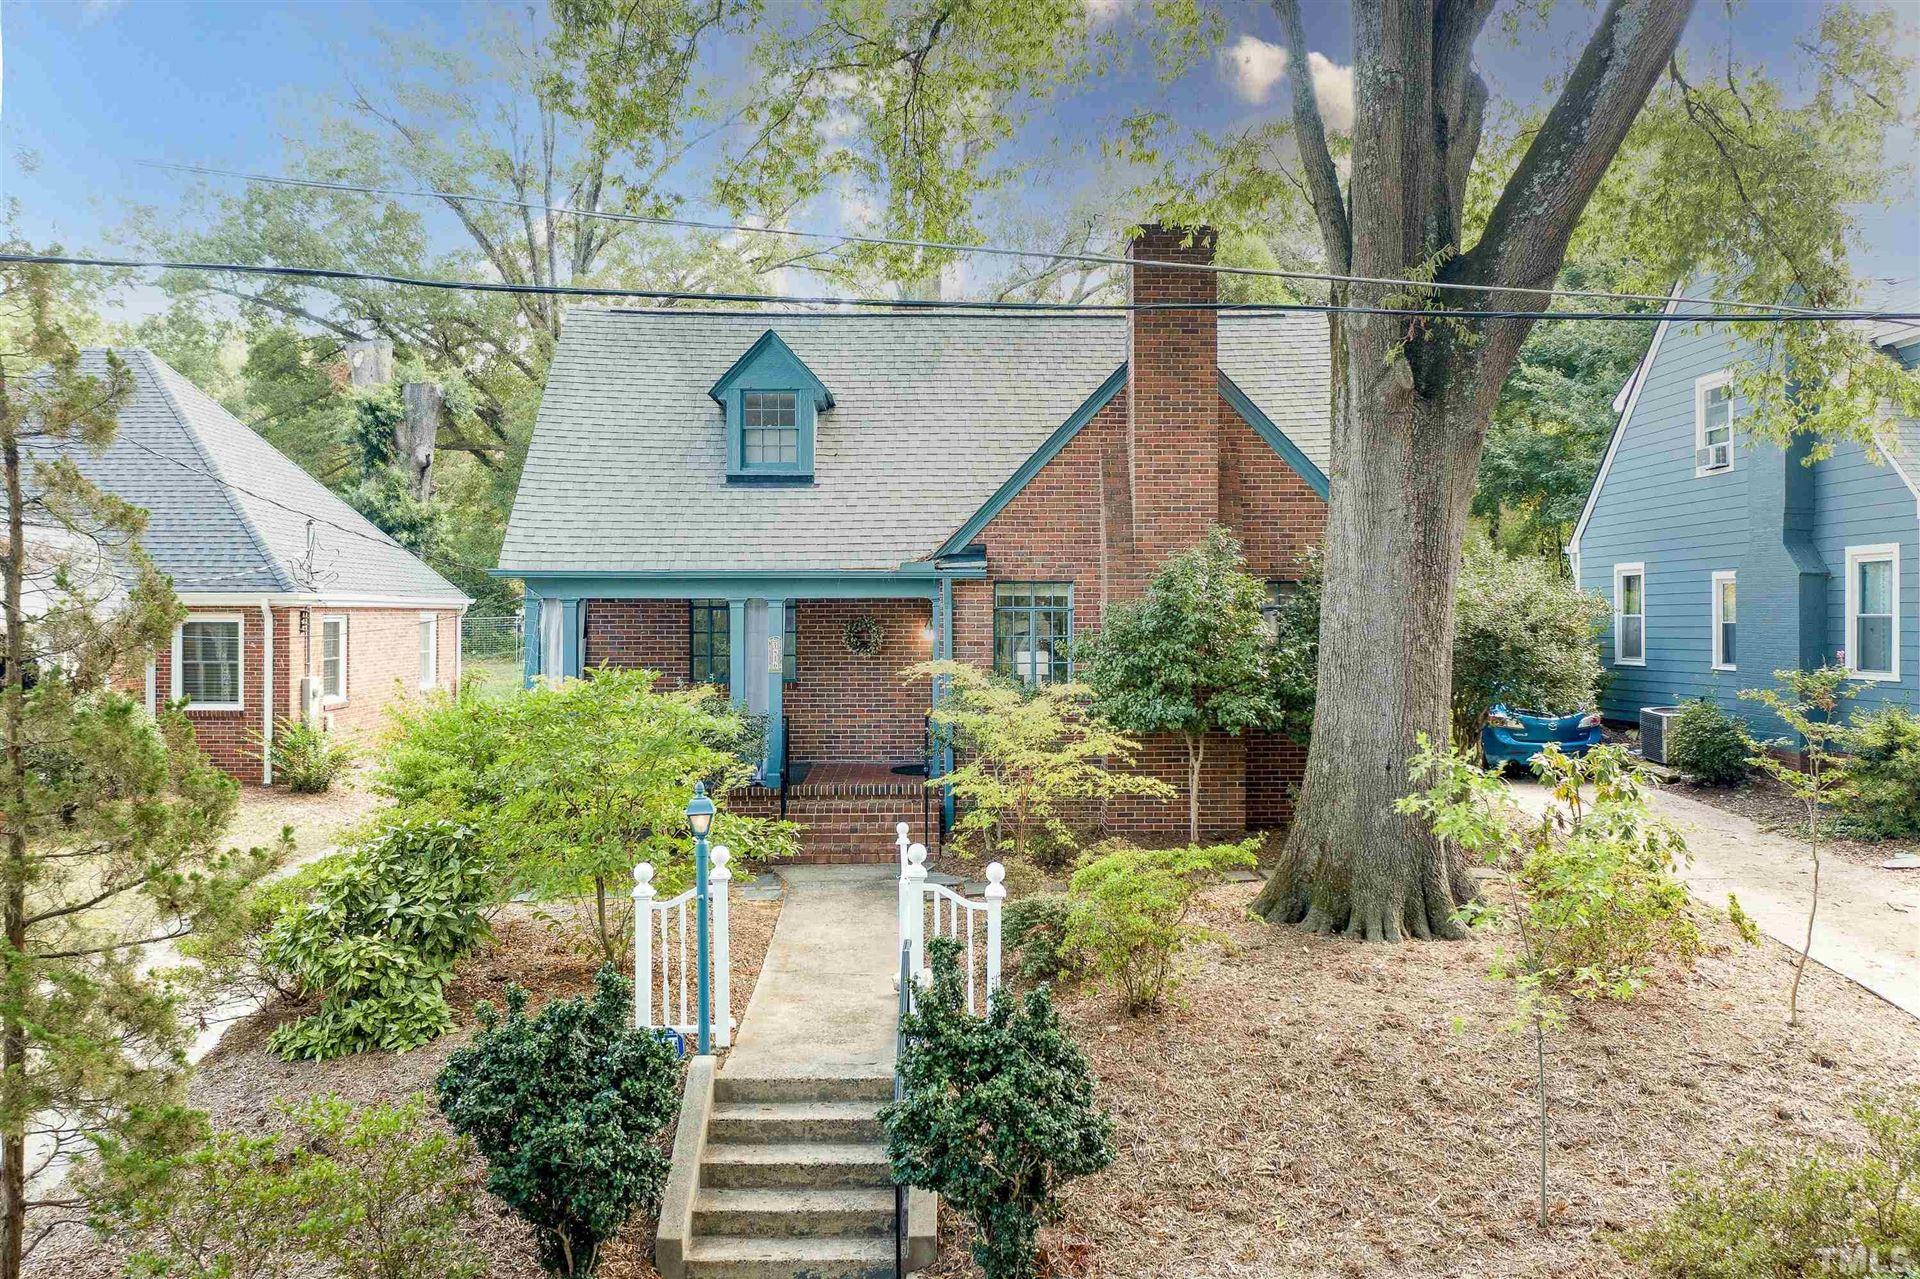 Photo of 1416 Dollar Avenue, Durham, NC 27701 (MLS # 2409063)